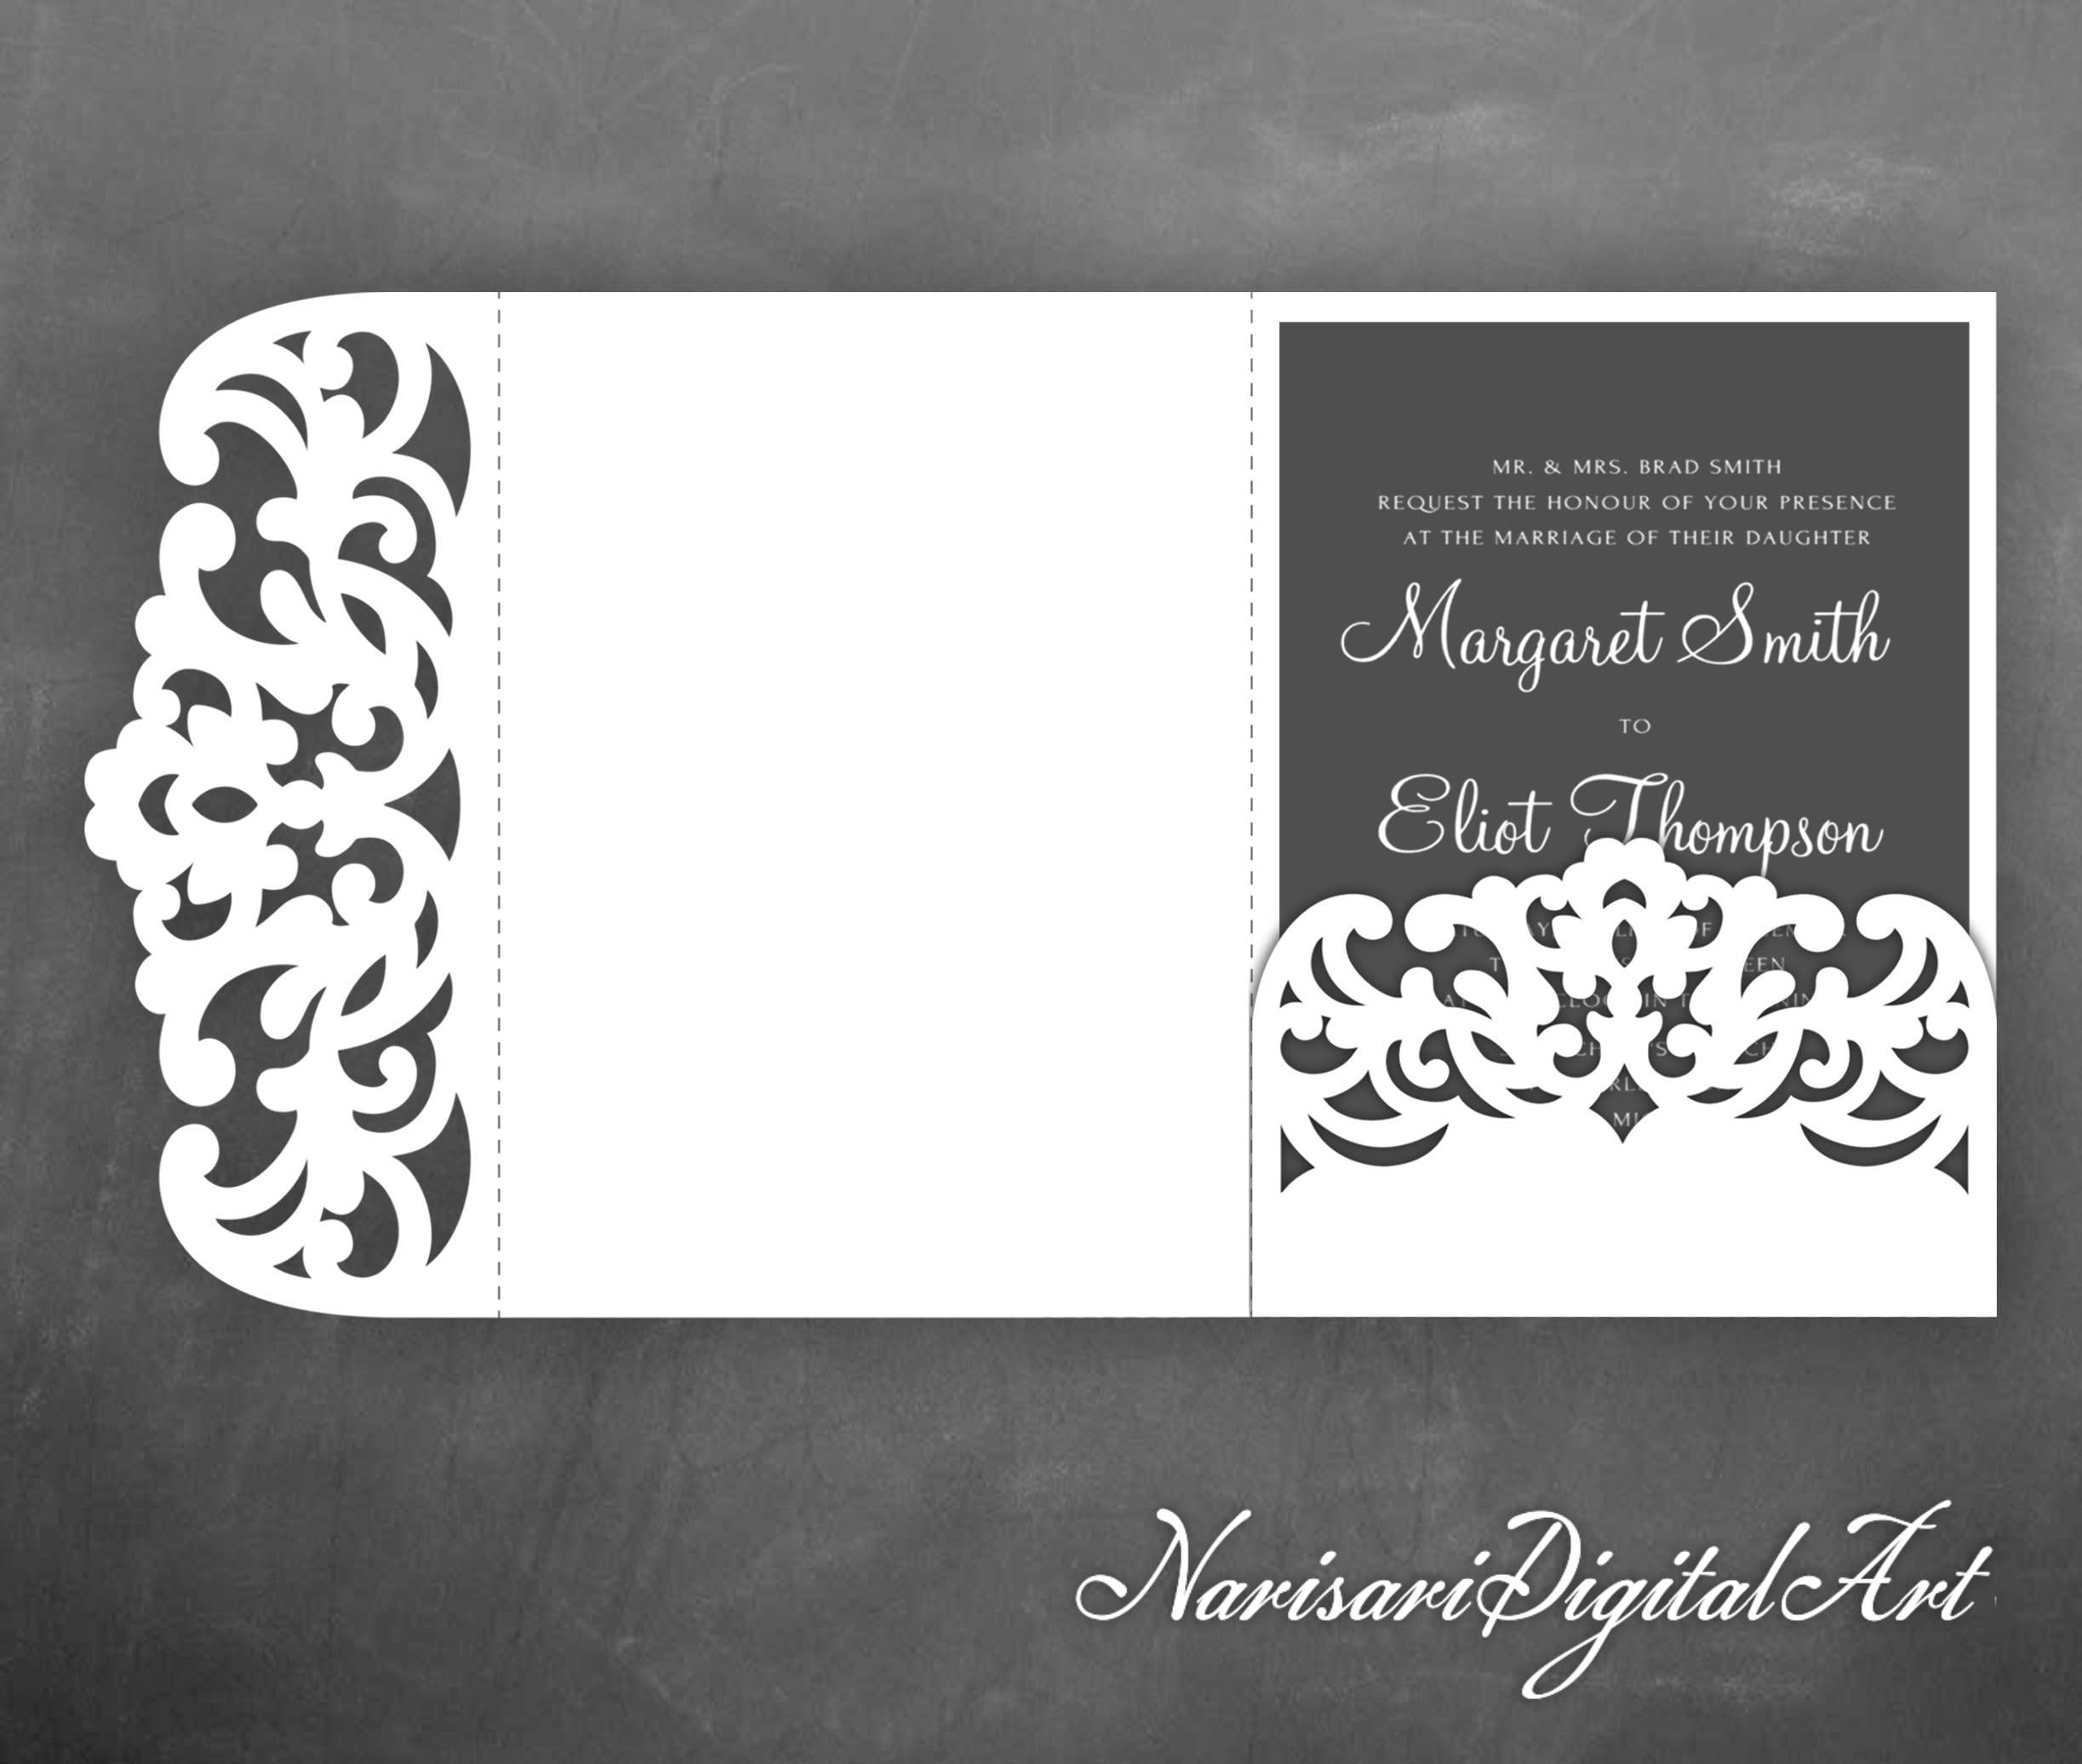 Tri-Fold Pocket Envelope 5x7 Wedding Invitation SVG Template